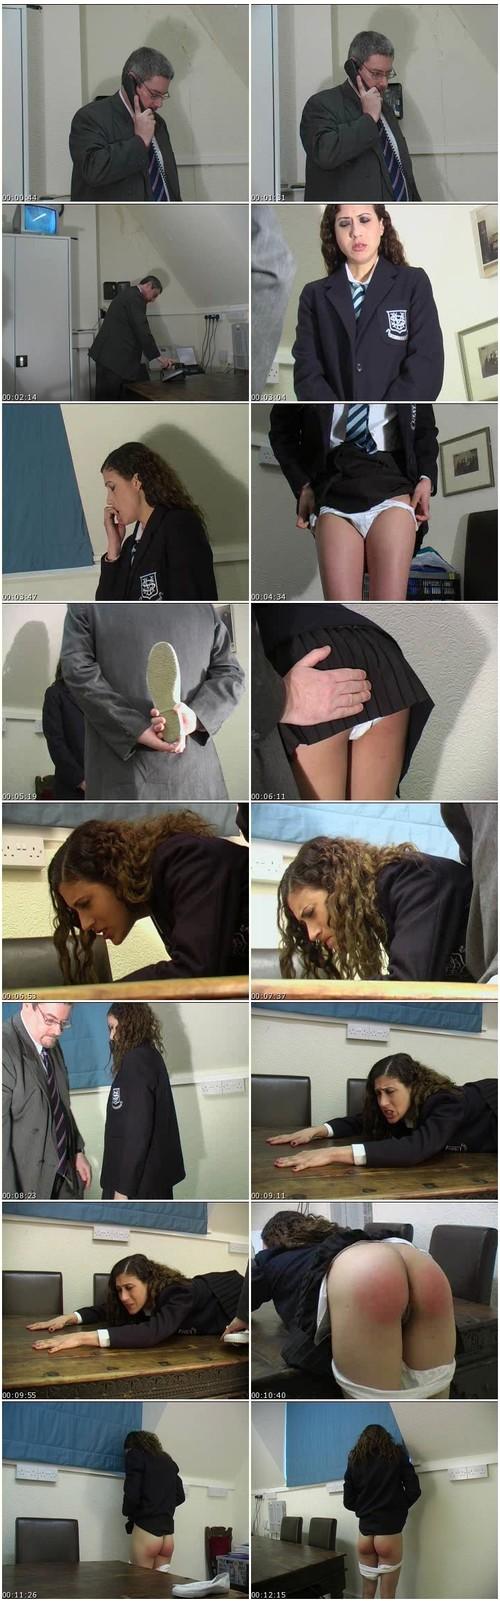 spanking059_thumb_m.jpg